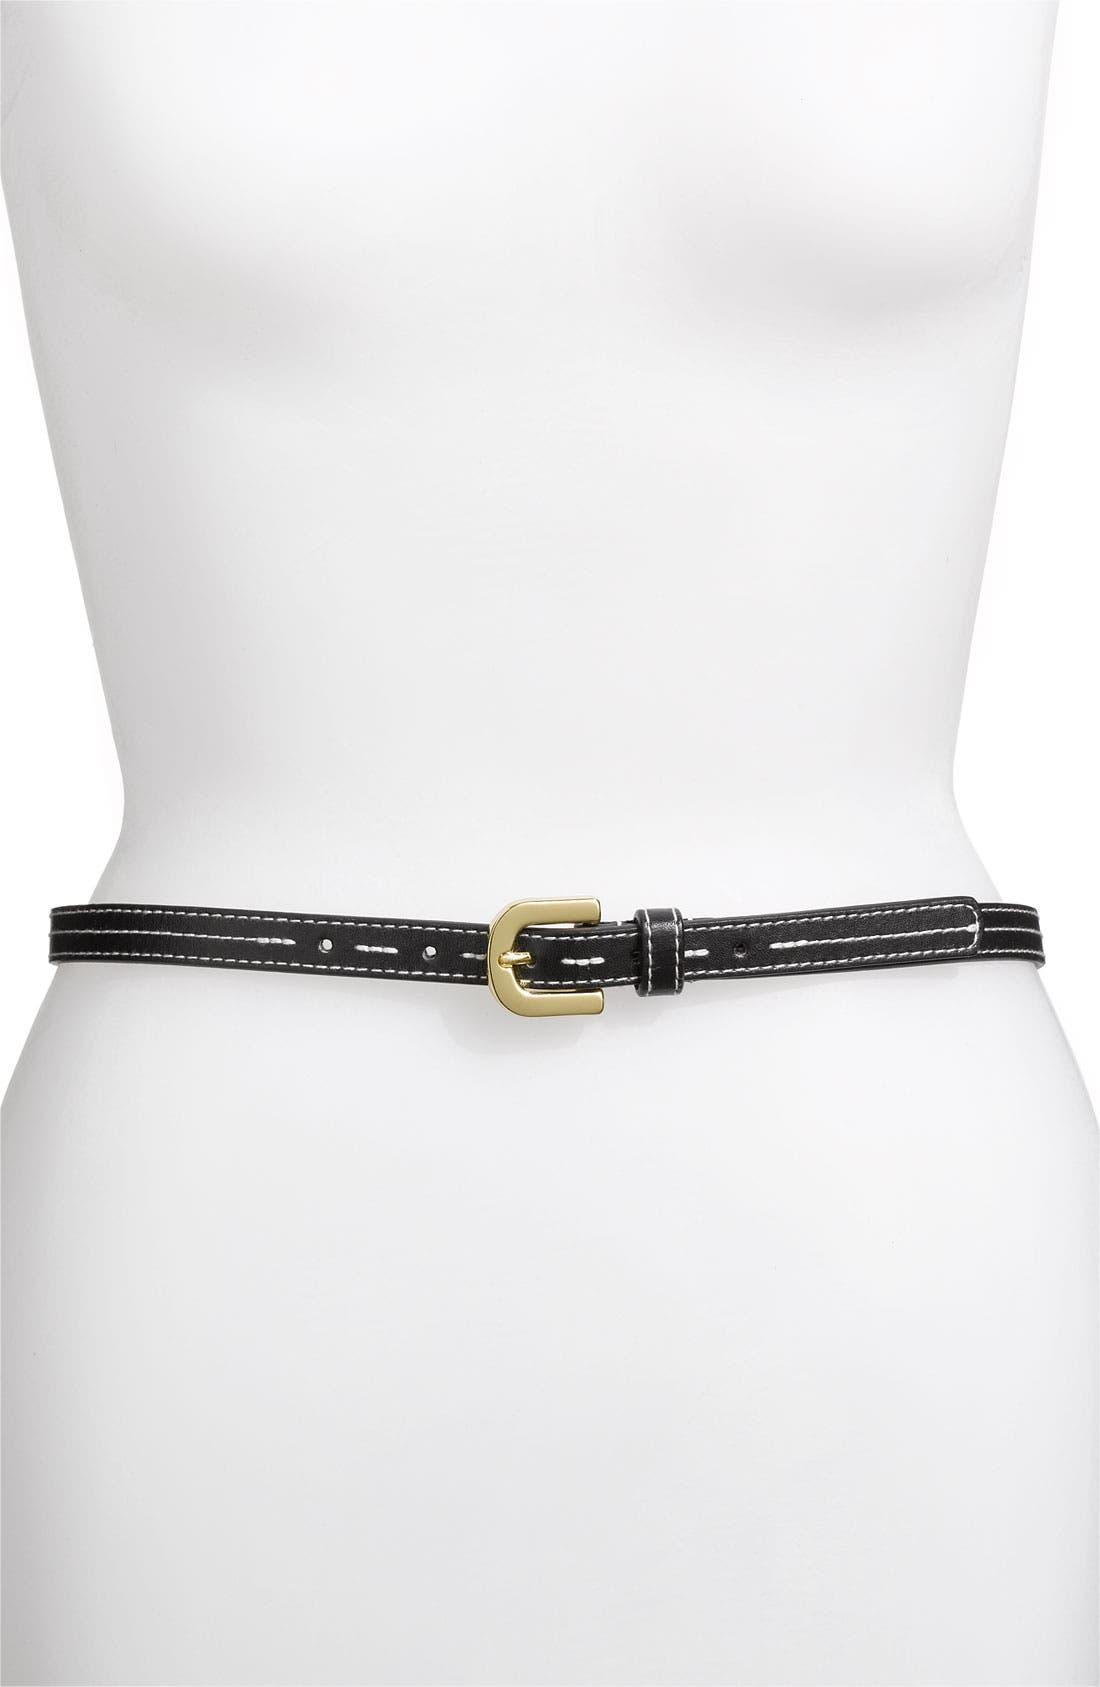 Main Image - Via Spiga 'Natural Stitch' Skinny Belt